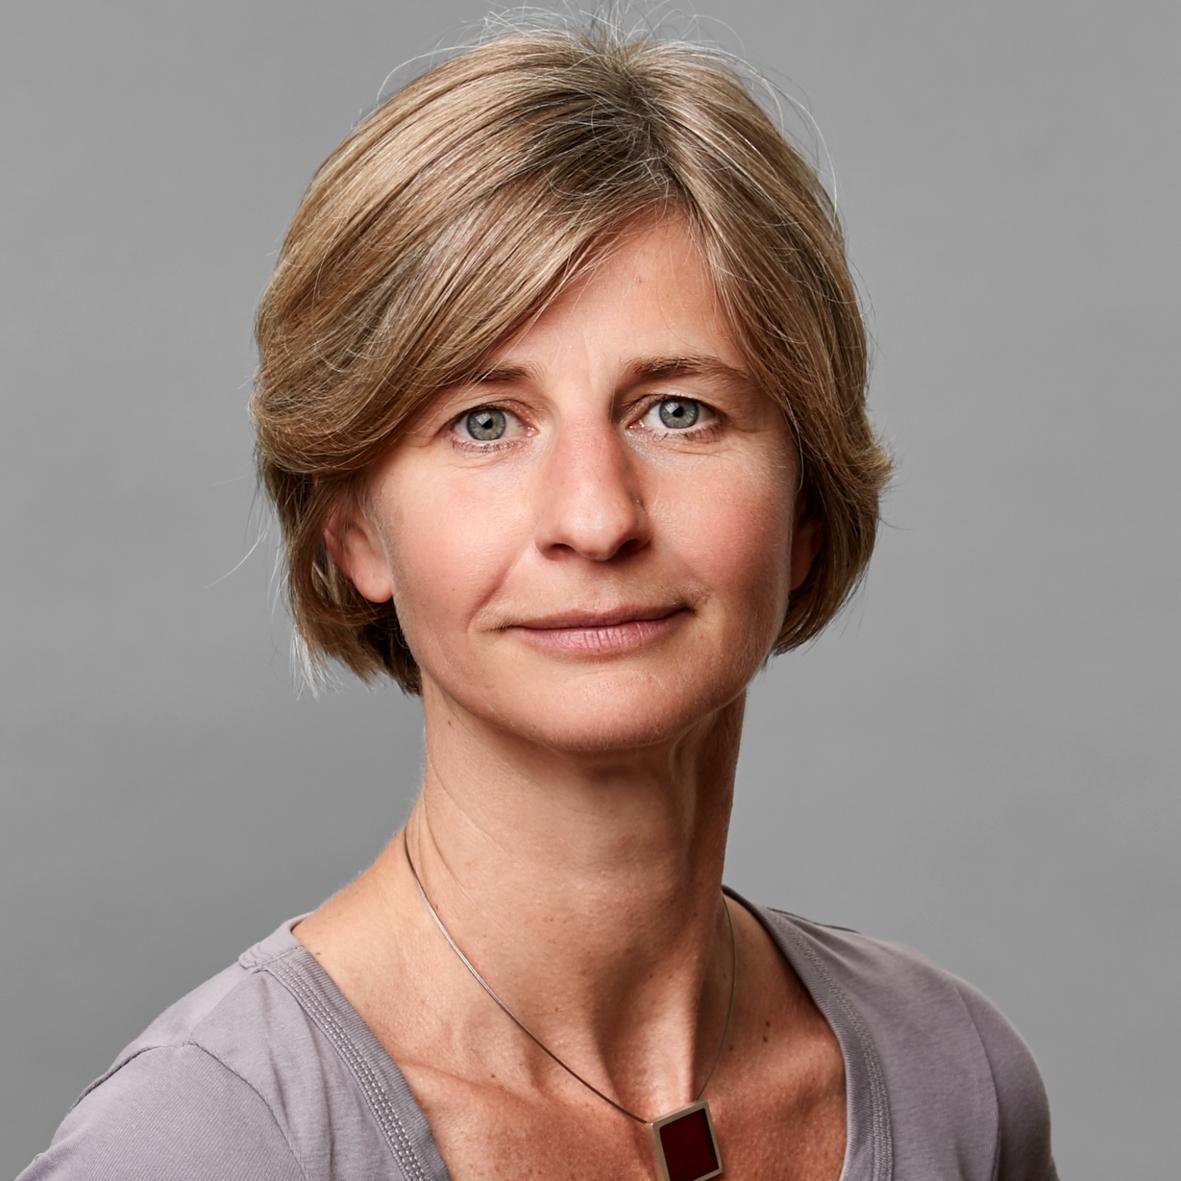 Swantje Weinhold